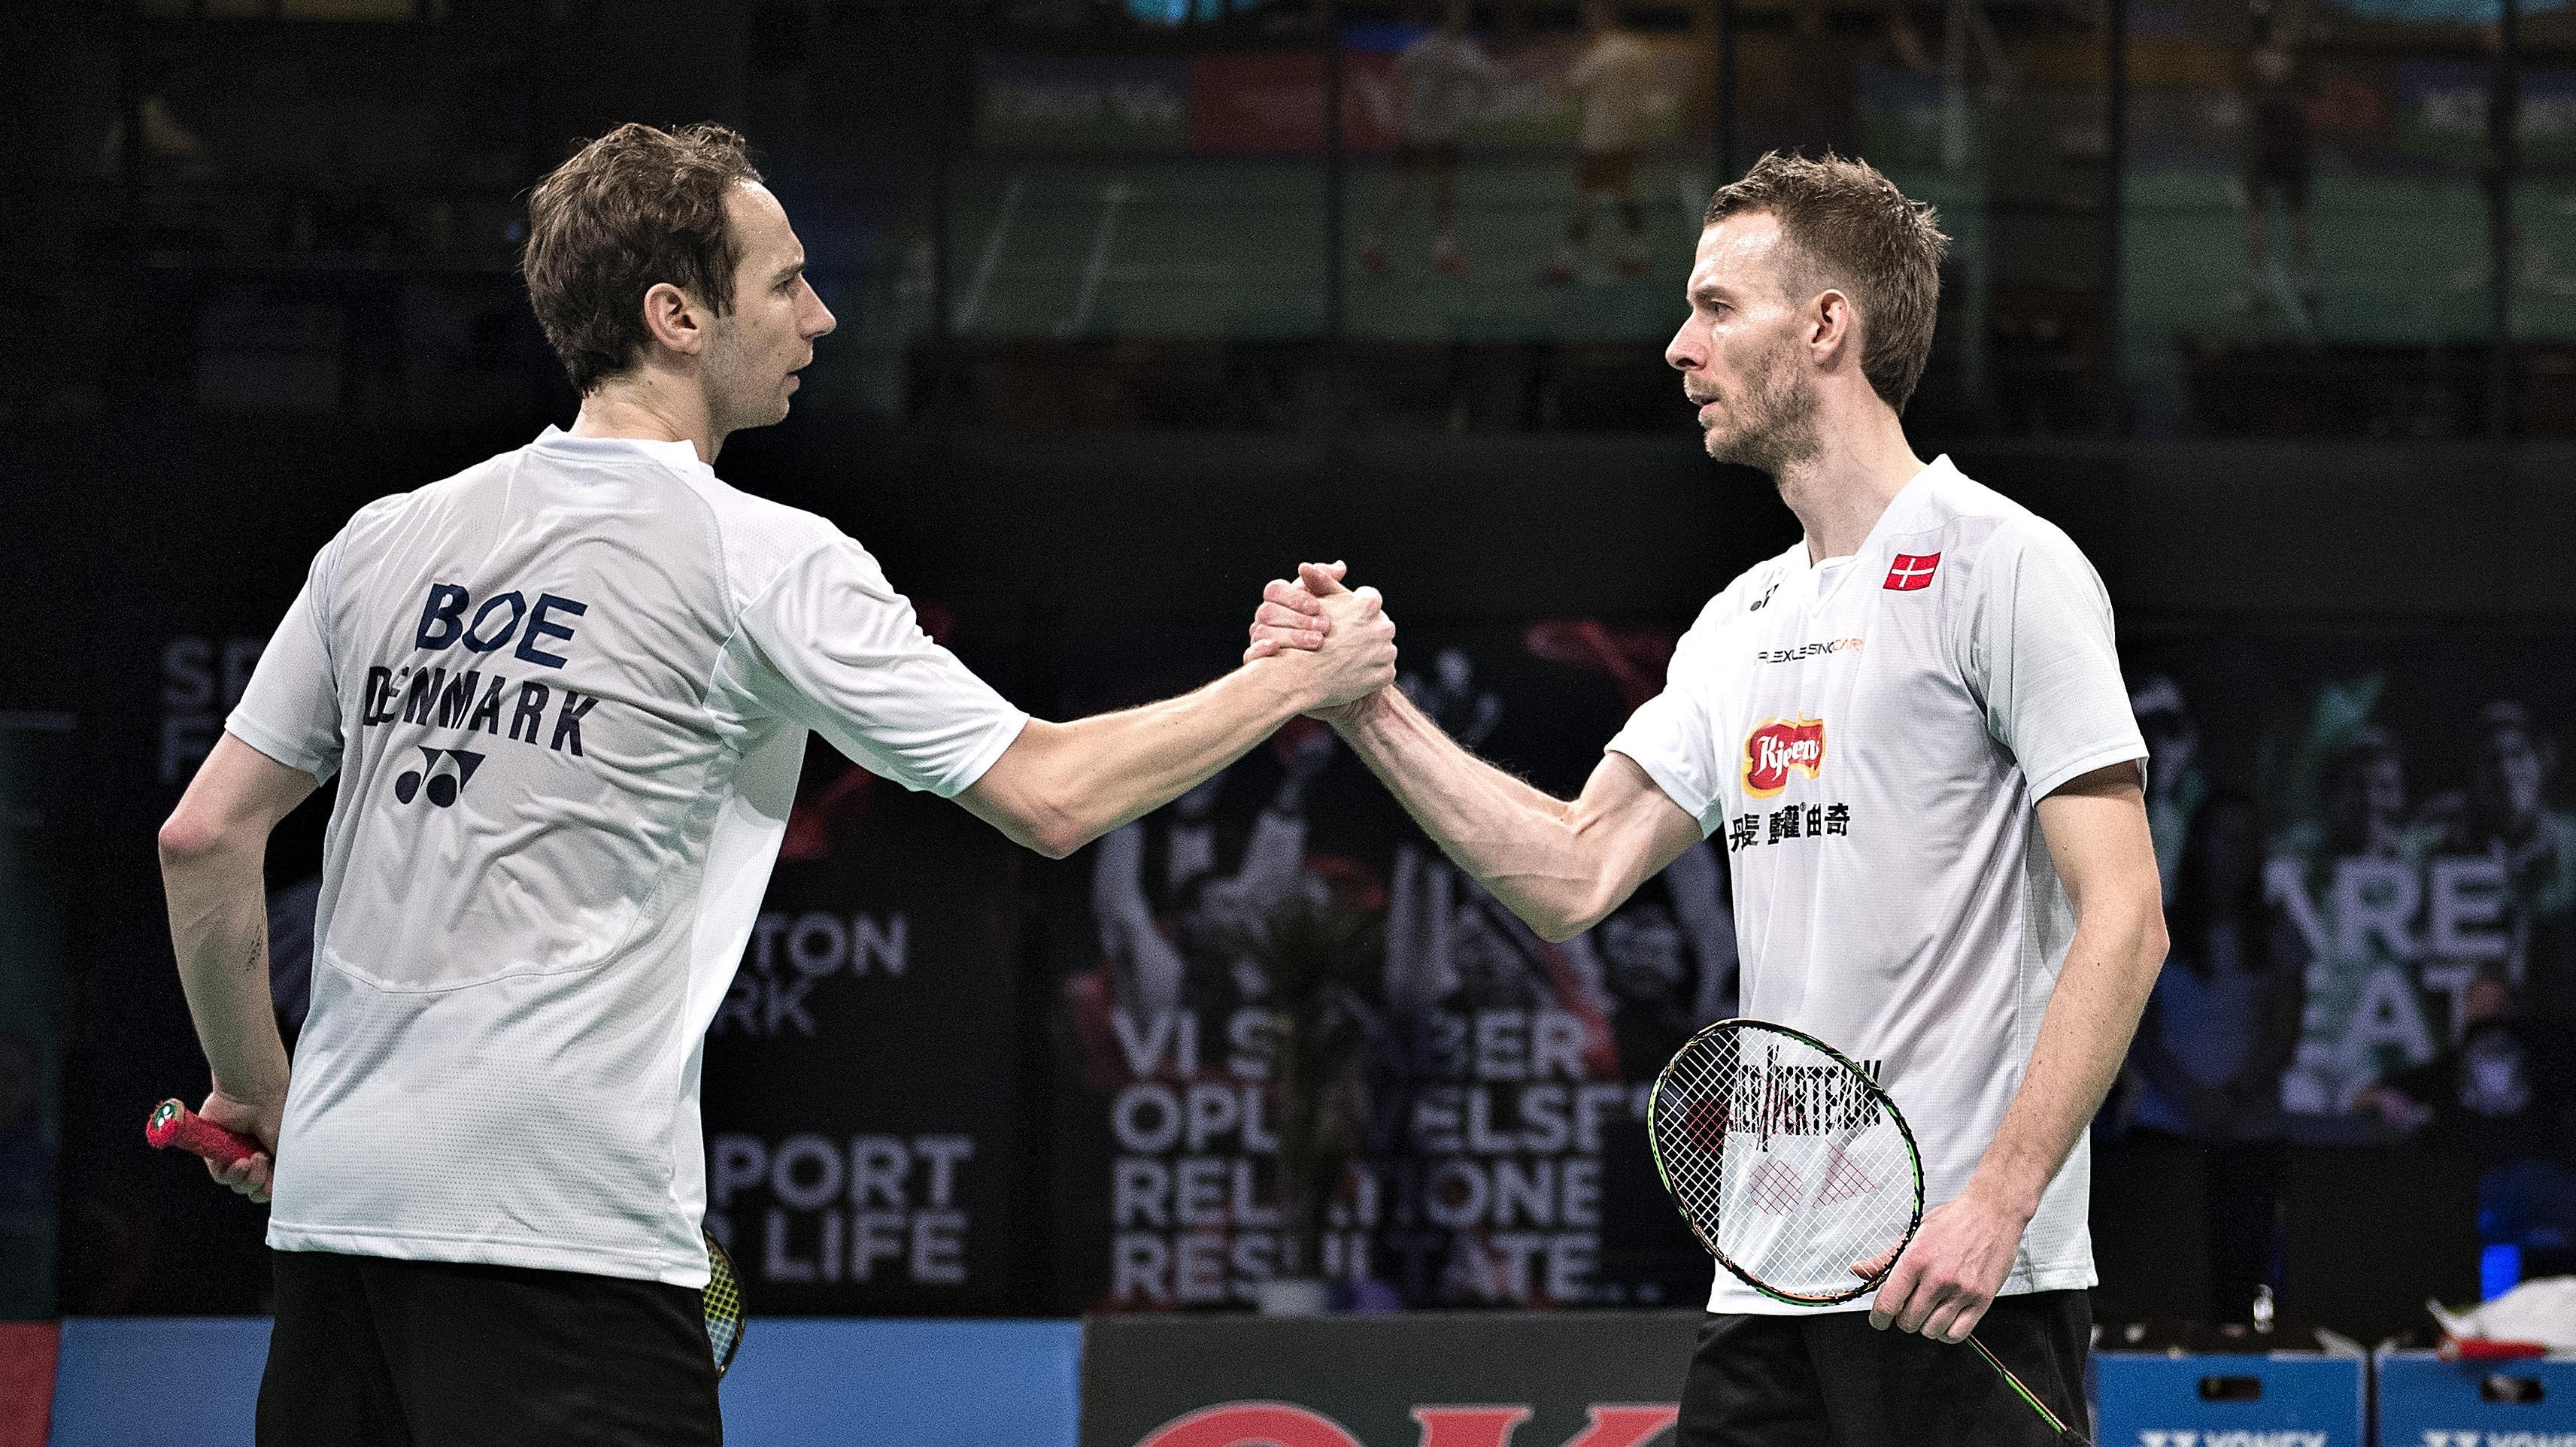 Vildt eback Carsten Mogensen er tilbage med sejr Badminton